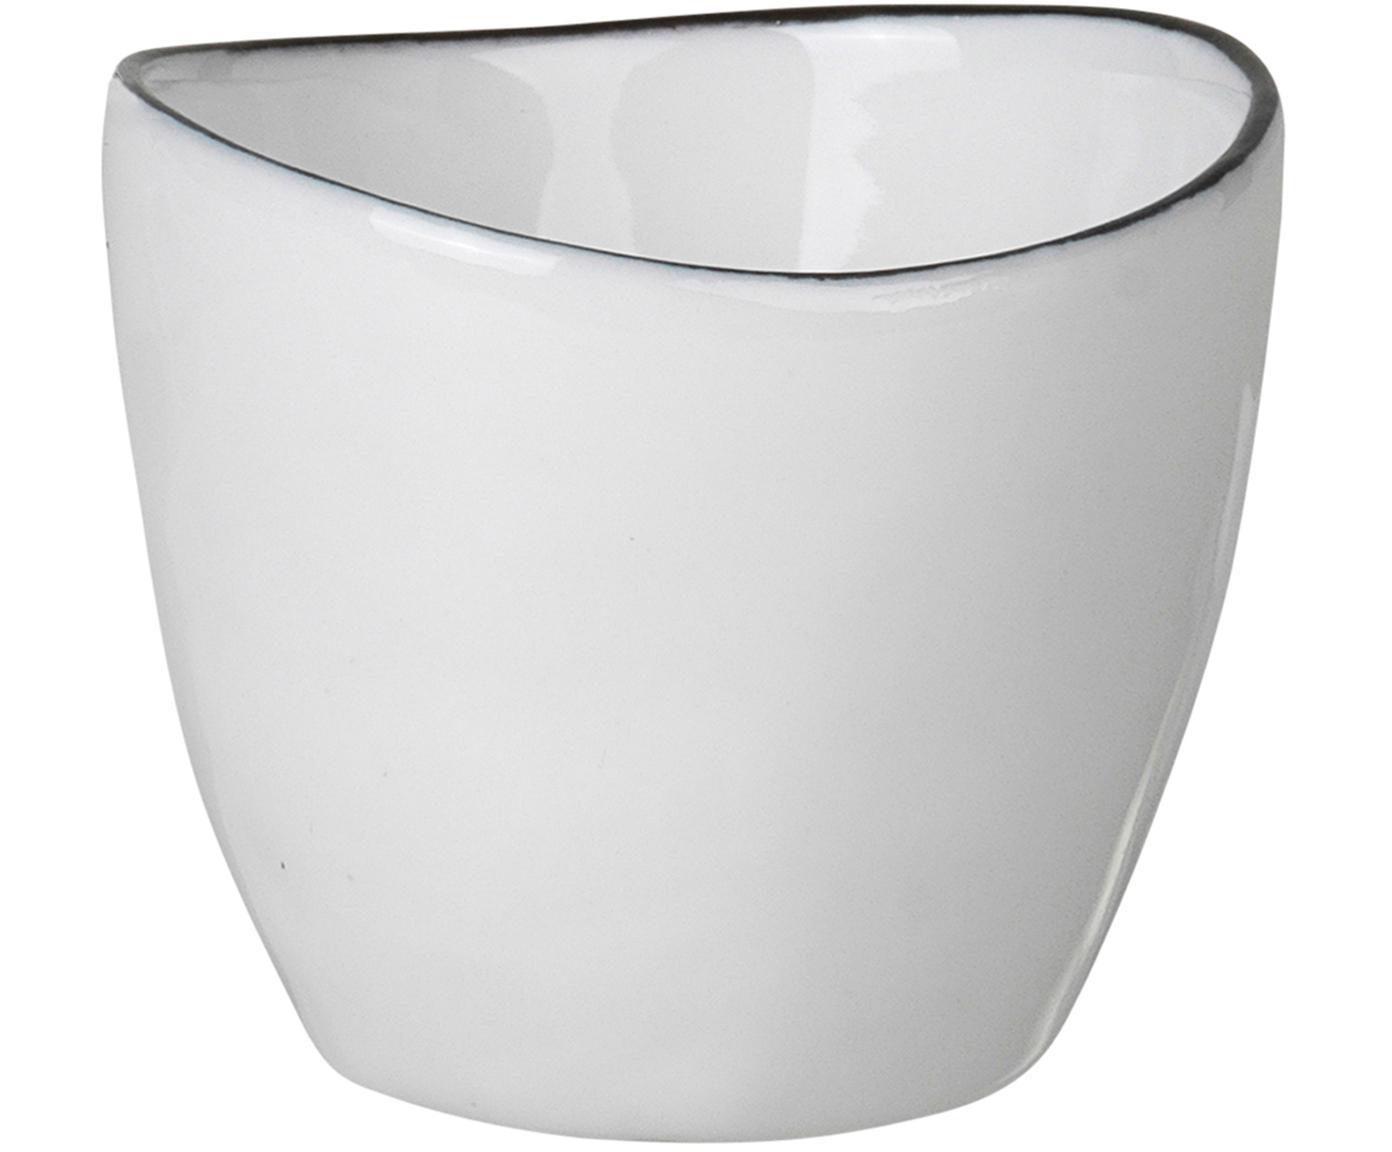 Set 4 portauova fatto a mano Salt, Porcellana, Bianco latteo, nero, Ø 5 x Alt. 4 cm